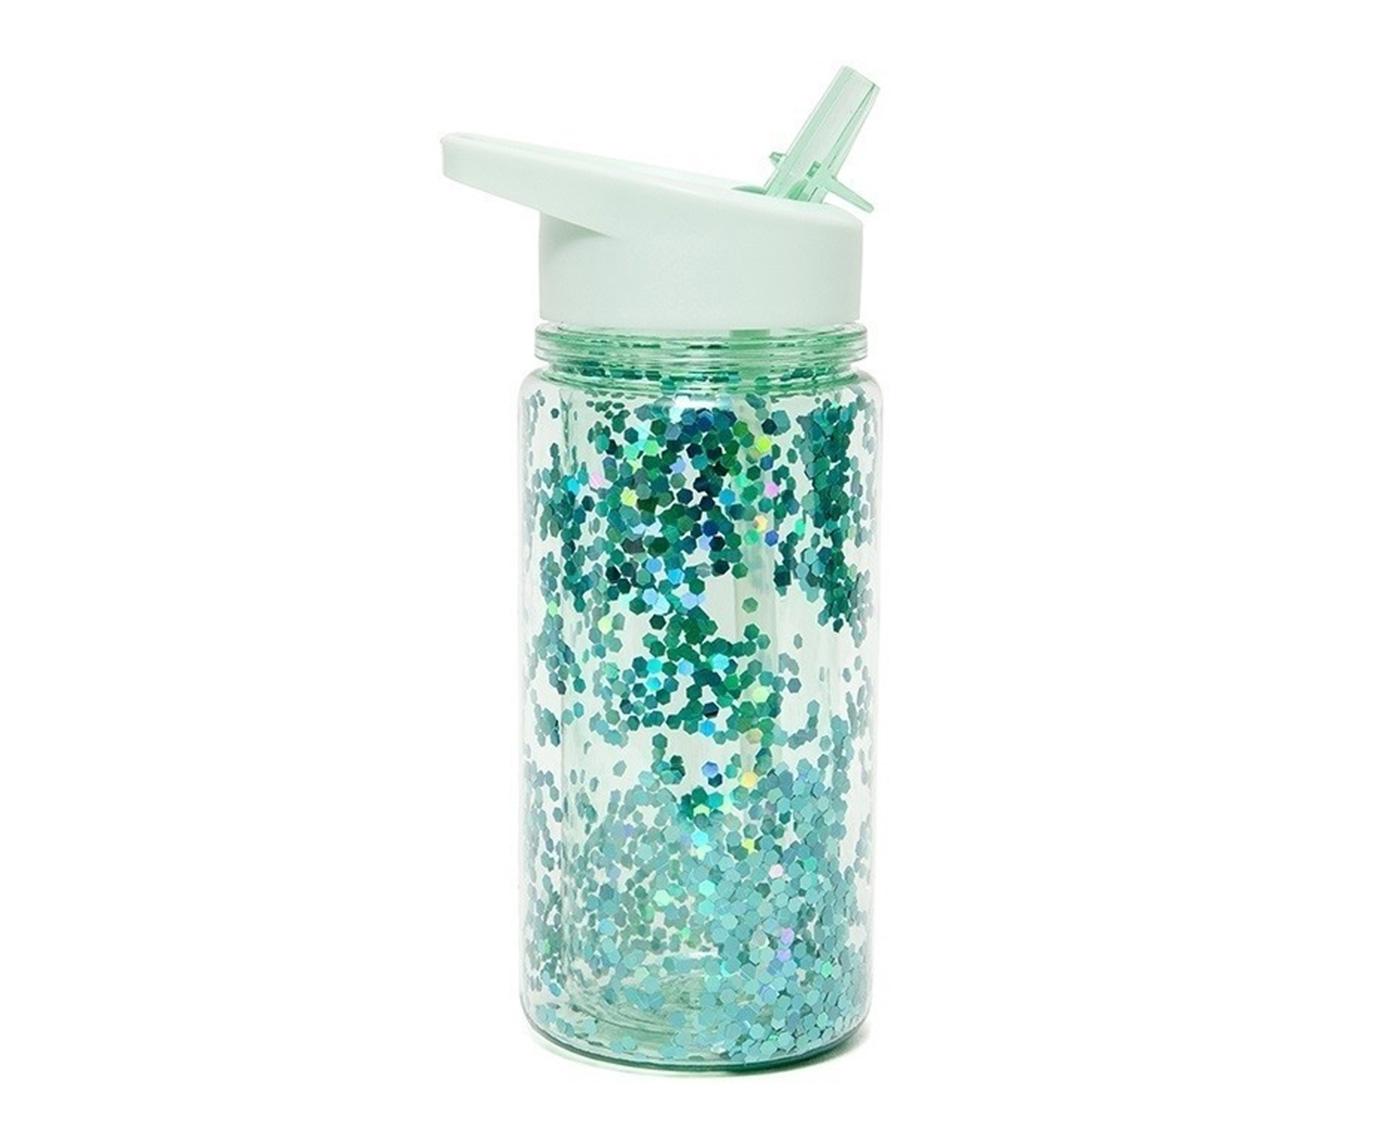 Drinkfles 'Glitter lily green' kleur